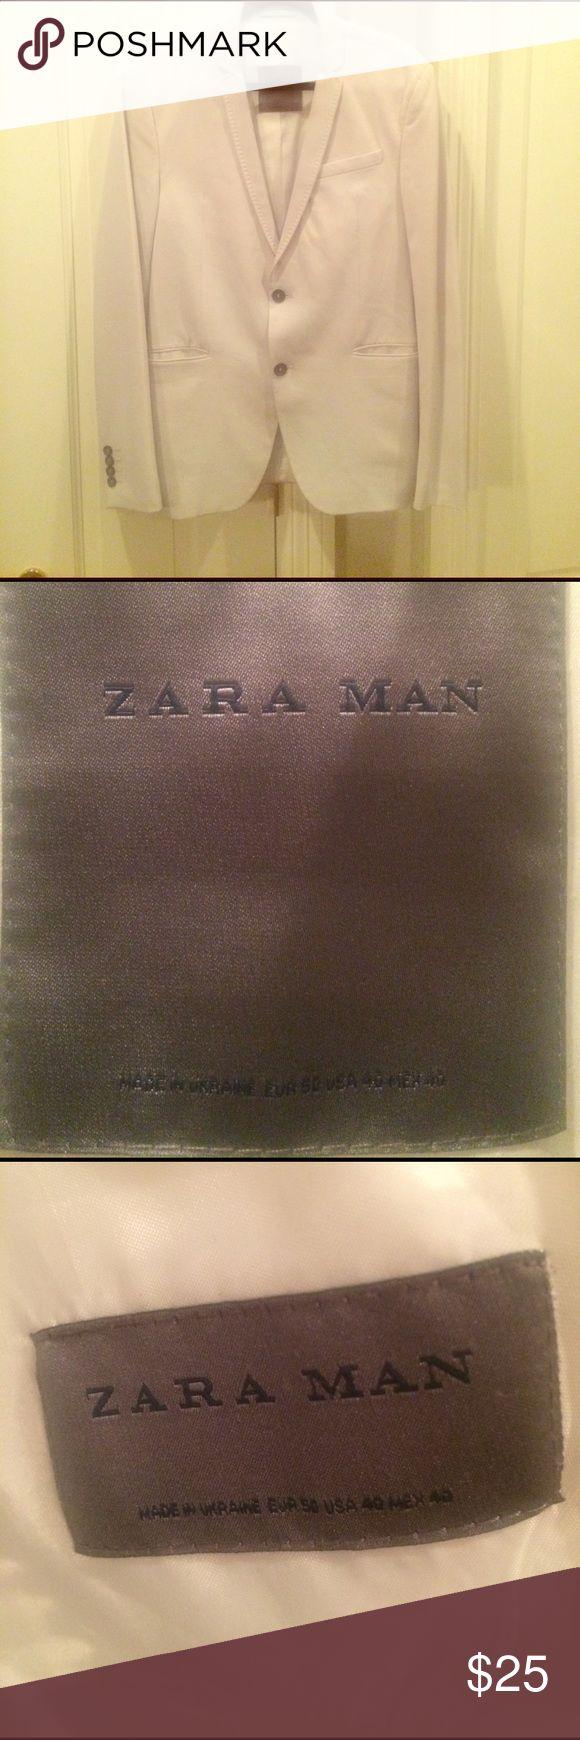 ZARA MAN - Off White Blazer ZARA MAN - Off White Blazer - Size: US 40 EUR 50 - Super soft & VERY lightweight. Zara Suits & Blazers Sport Coats & Blazers